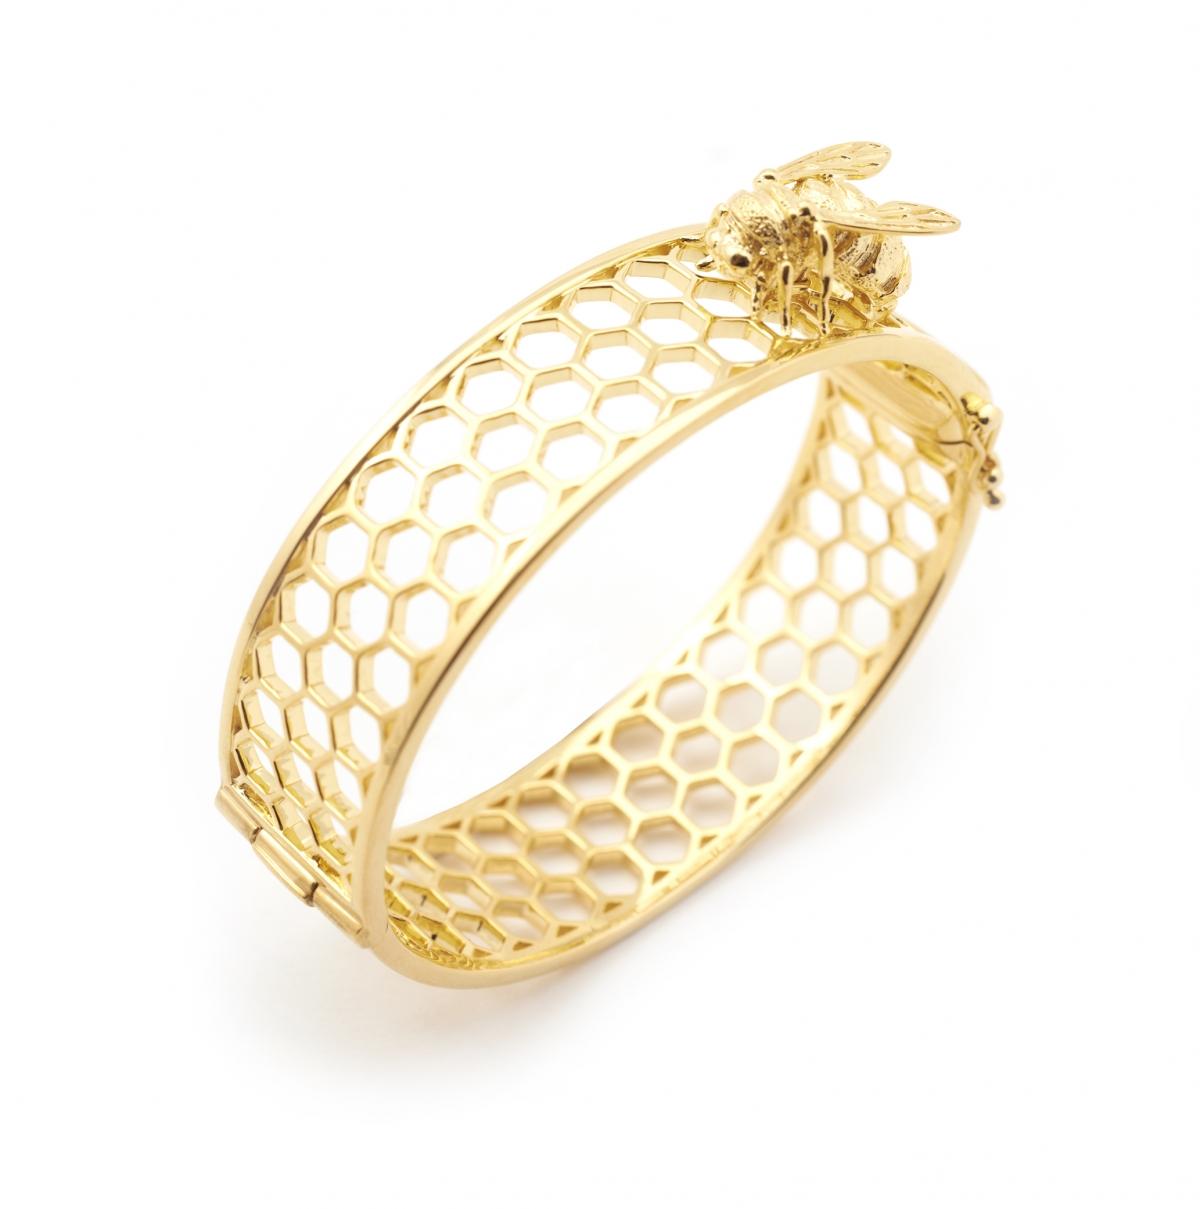 Honey Comb Bee Bangle Fashion Jewellery